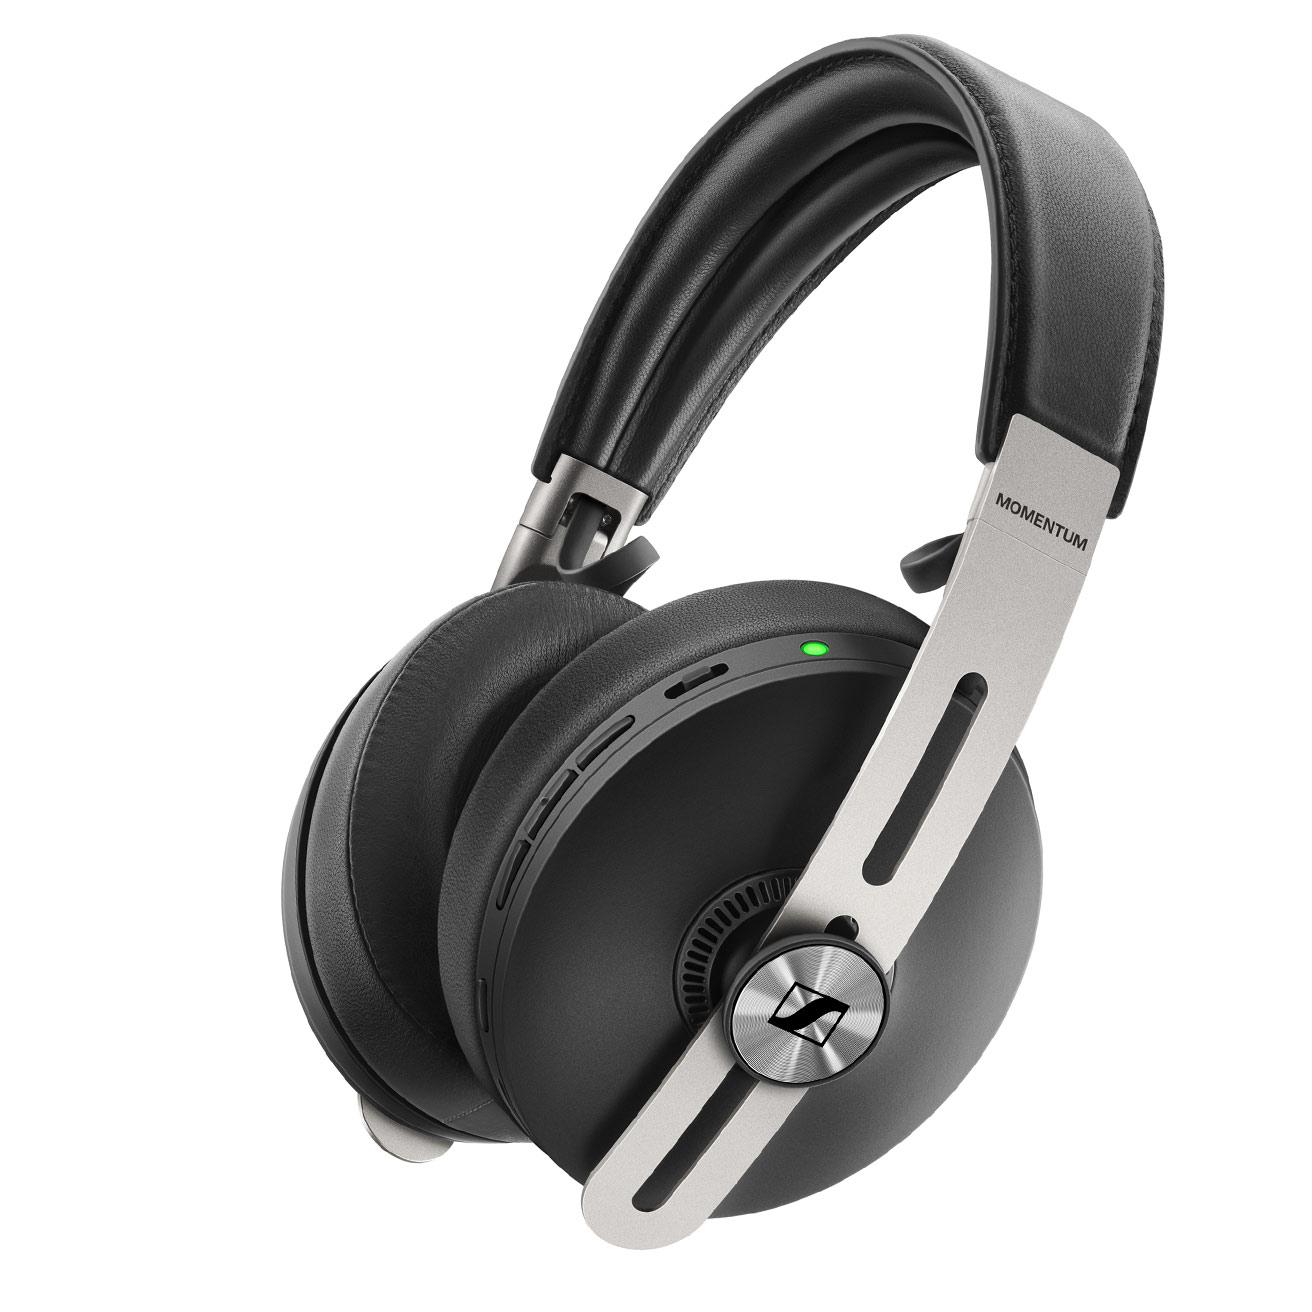 Sennheiser MOMENTUM 3 Wireless Headphones B-stock at £169 at Sennheiser Shop